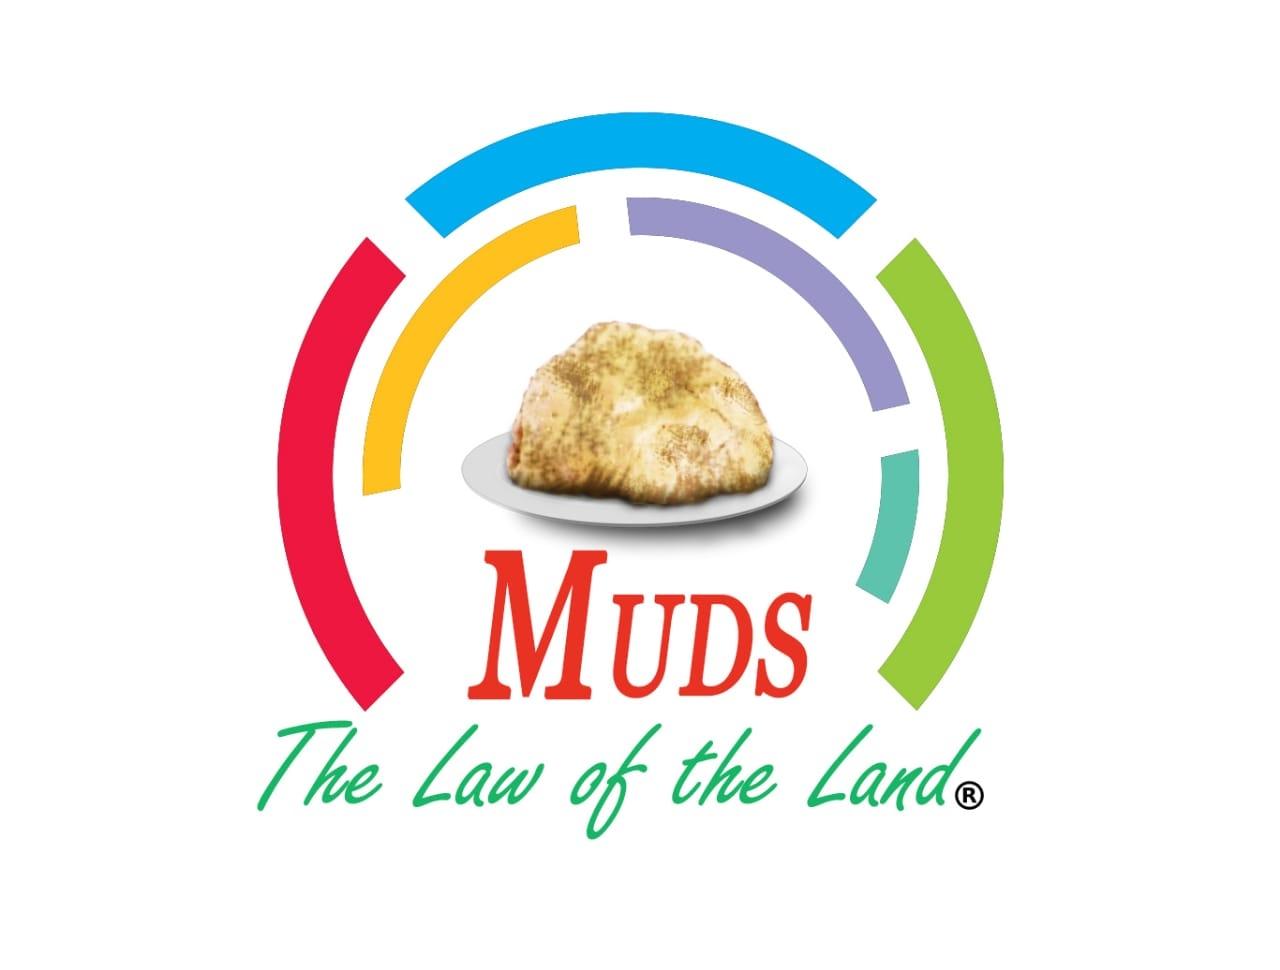 MUDS Management (@mudsmanagement11) Cover Image